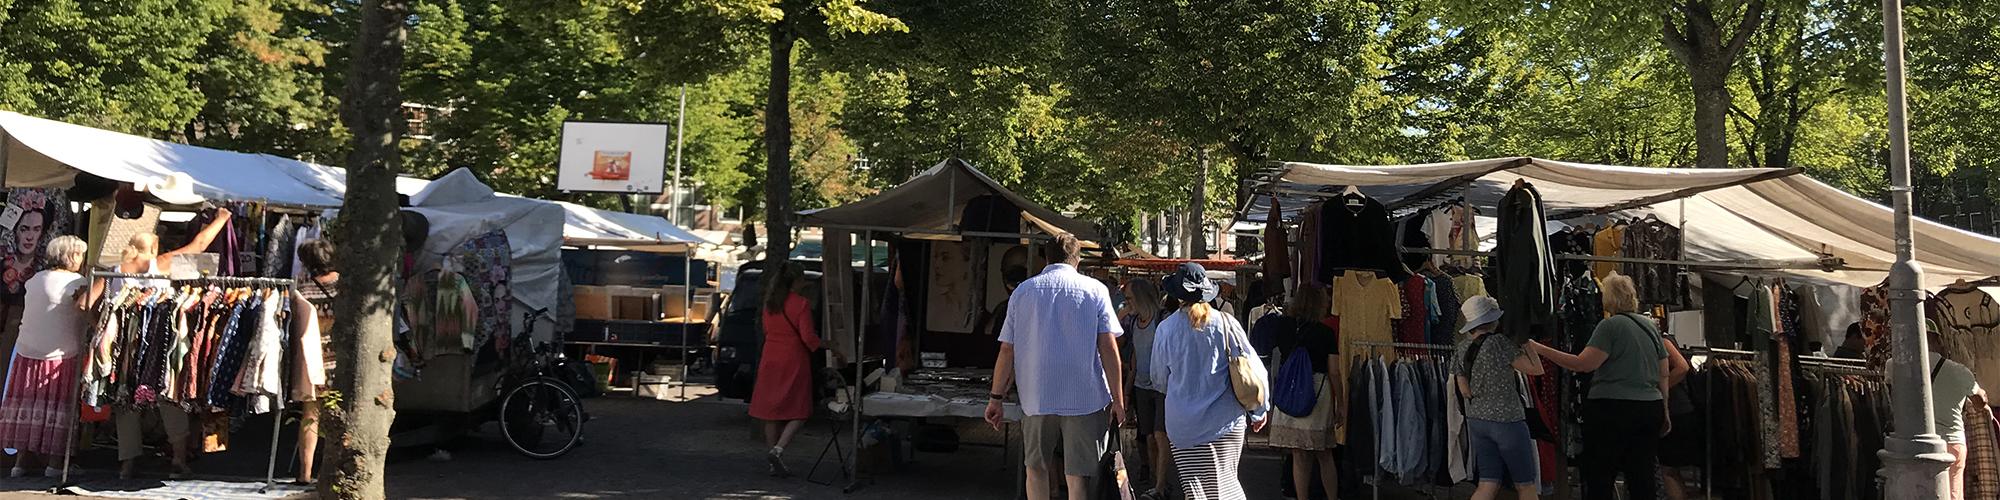 https://www.noordermarkt-amsterdam.nl/uploads/images/fotostroke/Noordermarkt-2.jpg